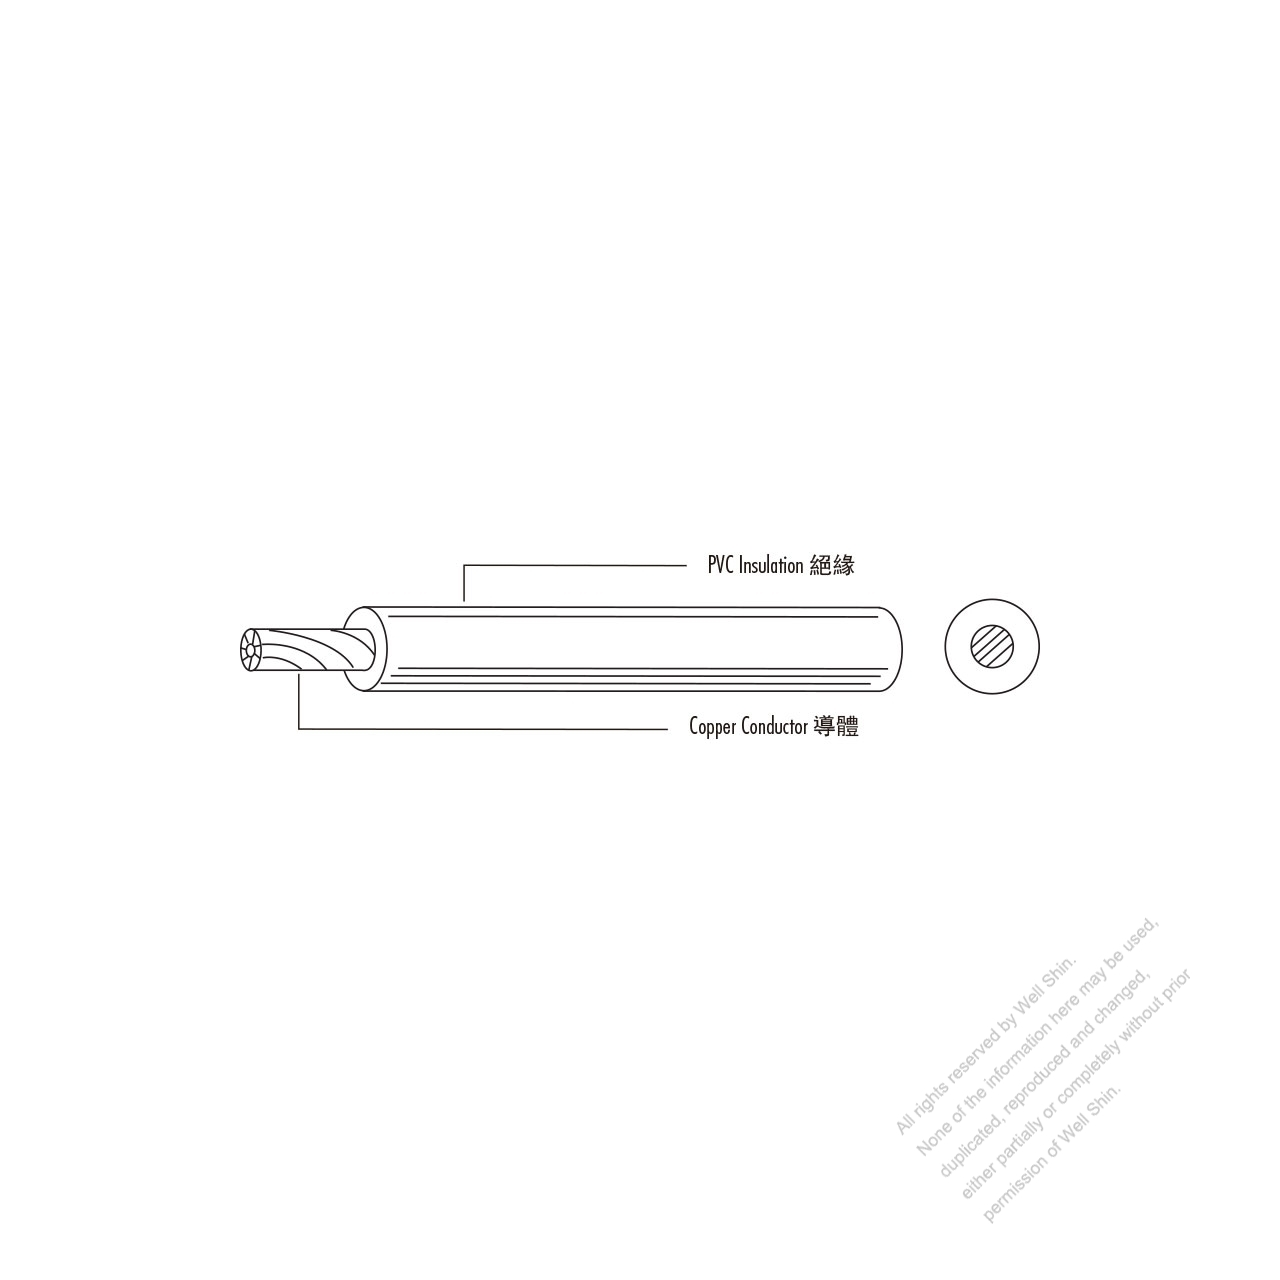 USA/Canada Type AC Power PVC Wire Thermoplastic UL TW THW THW-2 THHW ...